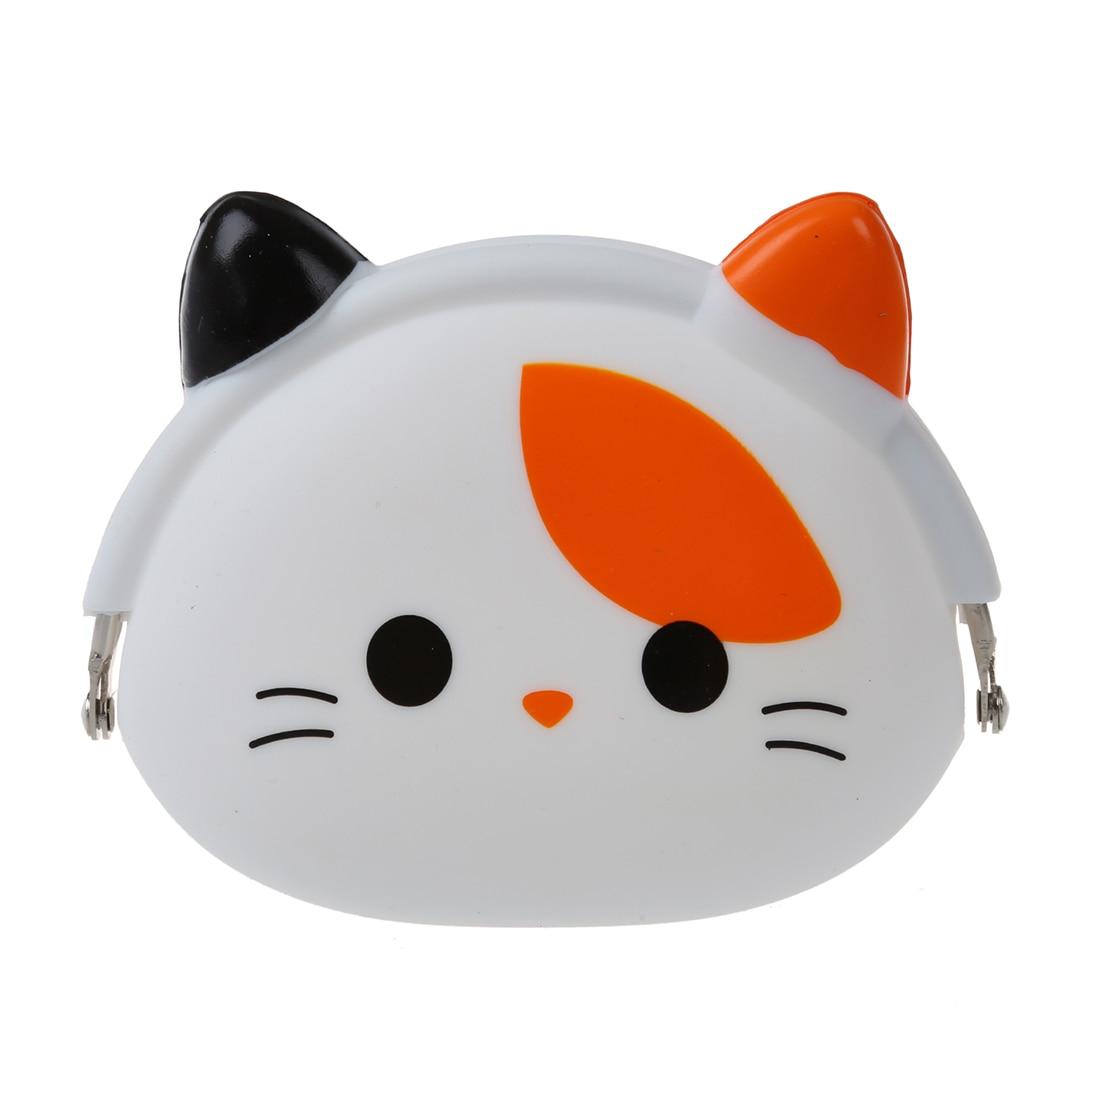 5 pcs of Women Girls Wallet Kawaii Cute Cartoon Animal Silicone Jelly Coin Bag Purse Kids Gift Small Cat